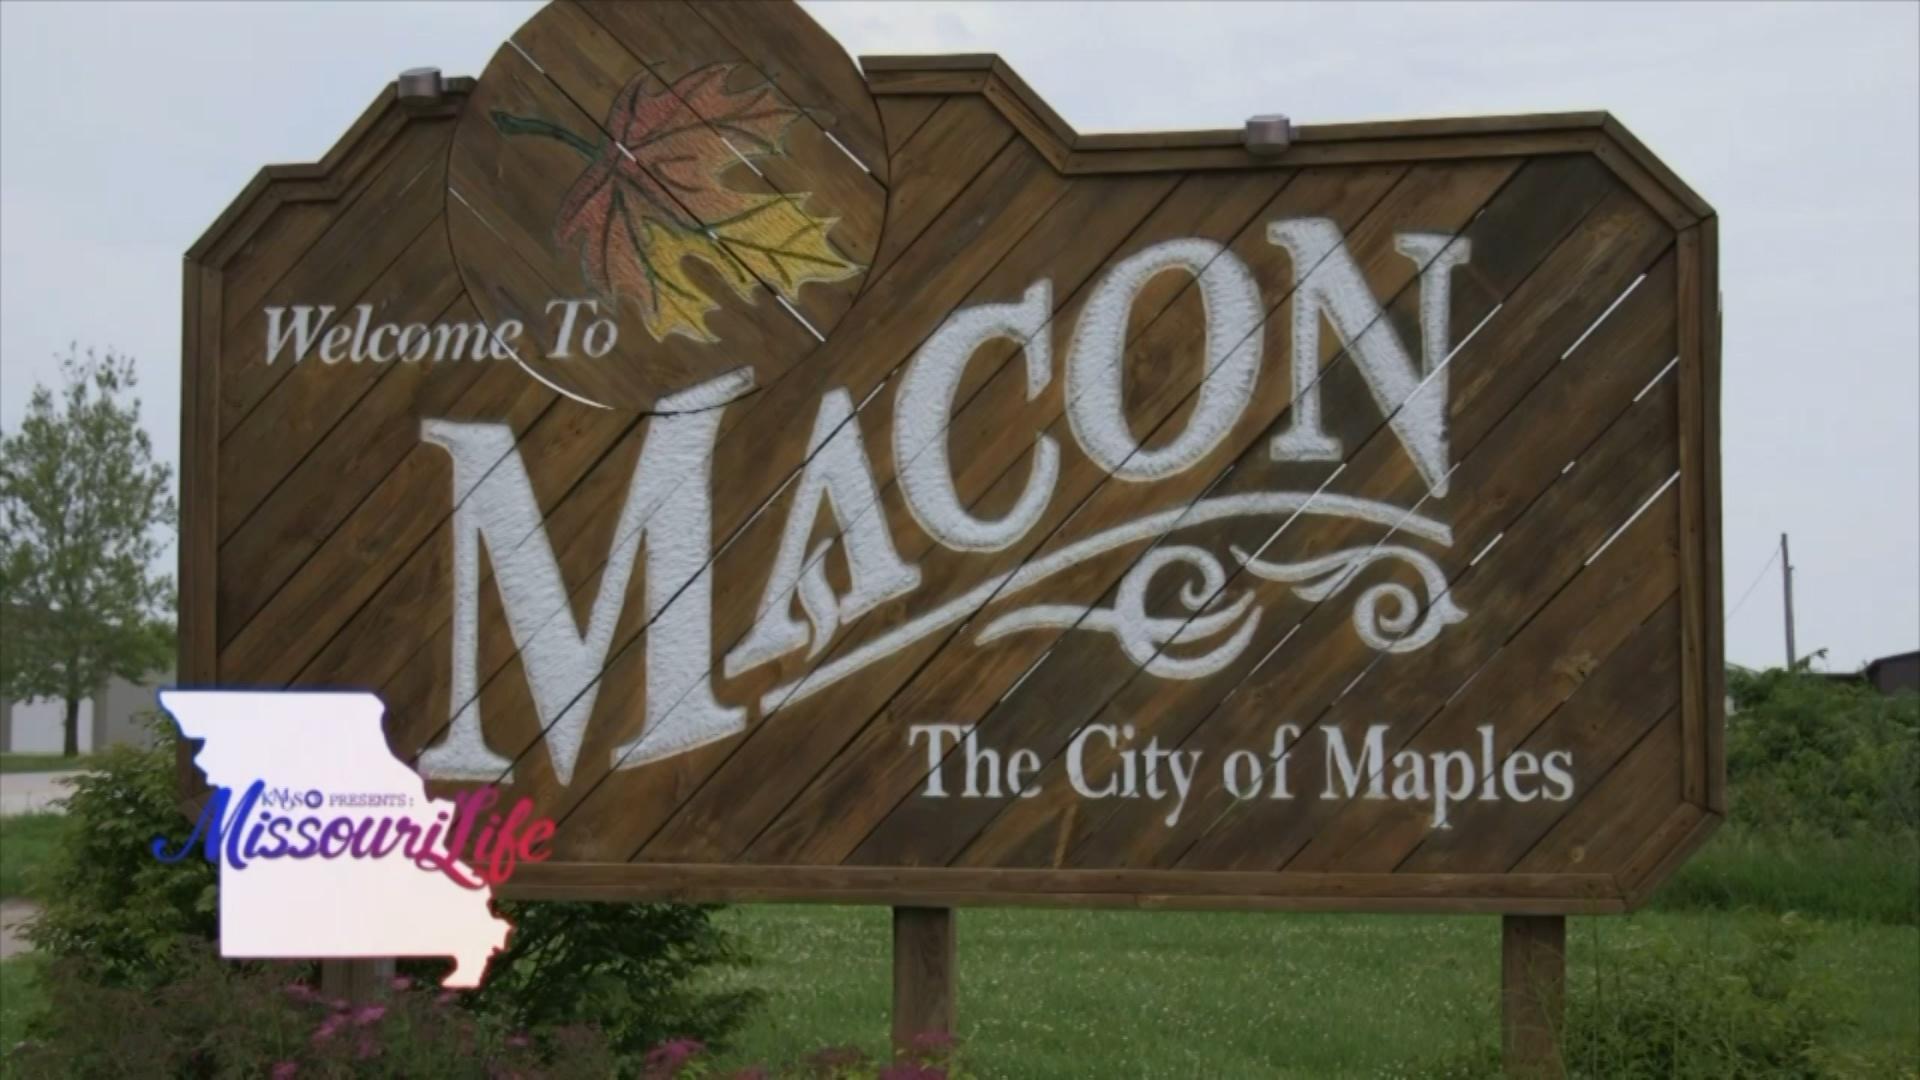 KMOS Presents Missouri Life Macon